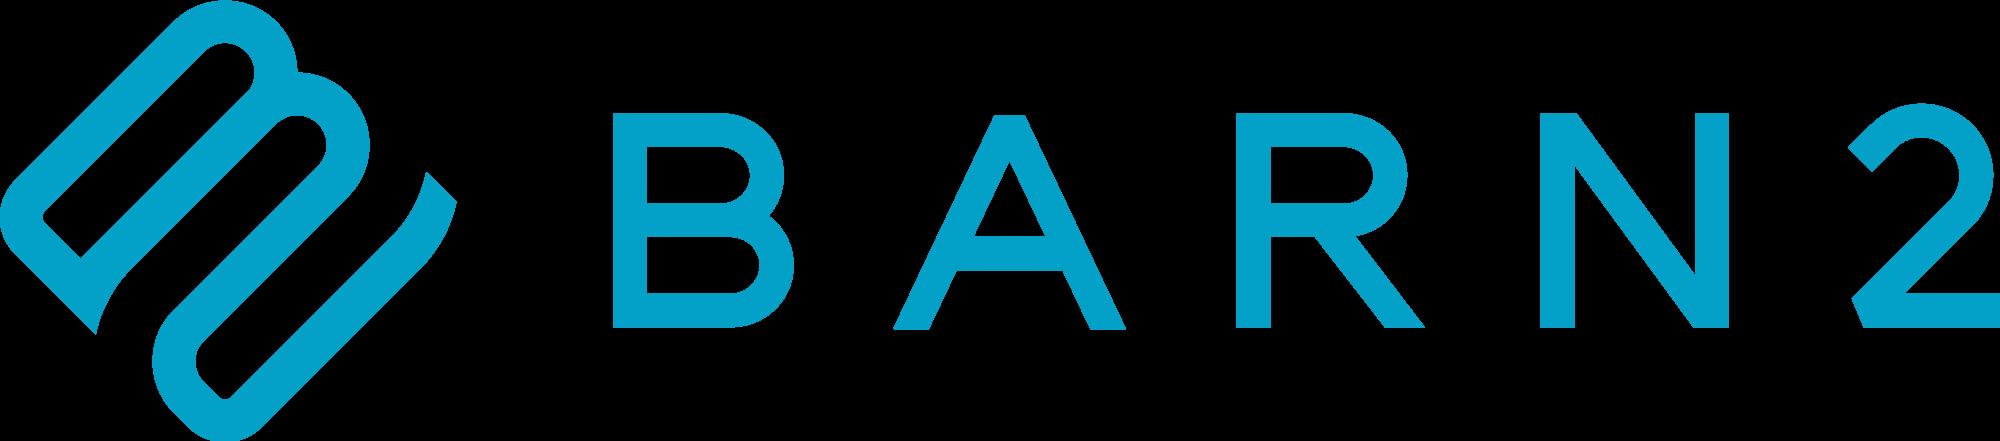 Barn2 Plugins Logo WPism